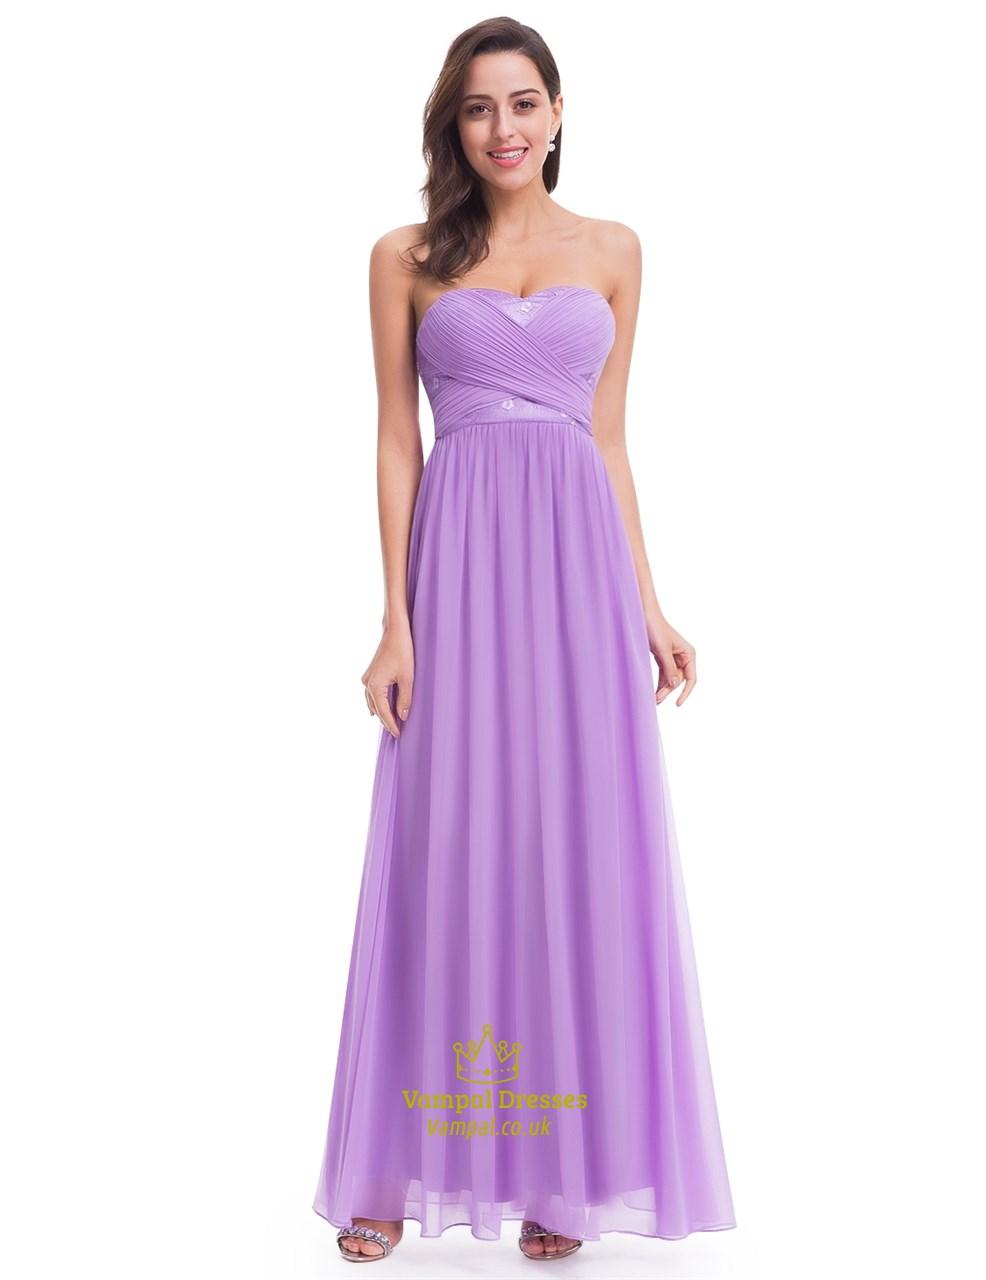 819ed61800 Elegant Lavender Sleeveless Floor Length Chiffon Bridesmaid Dress SKU  -FS1998